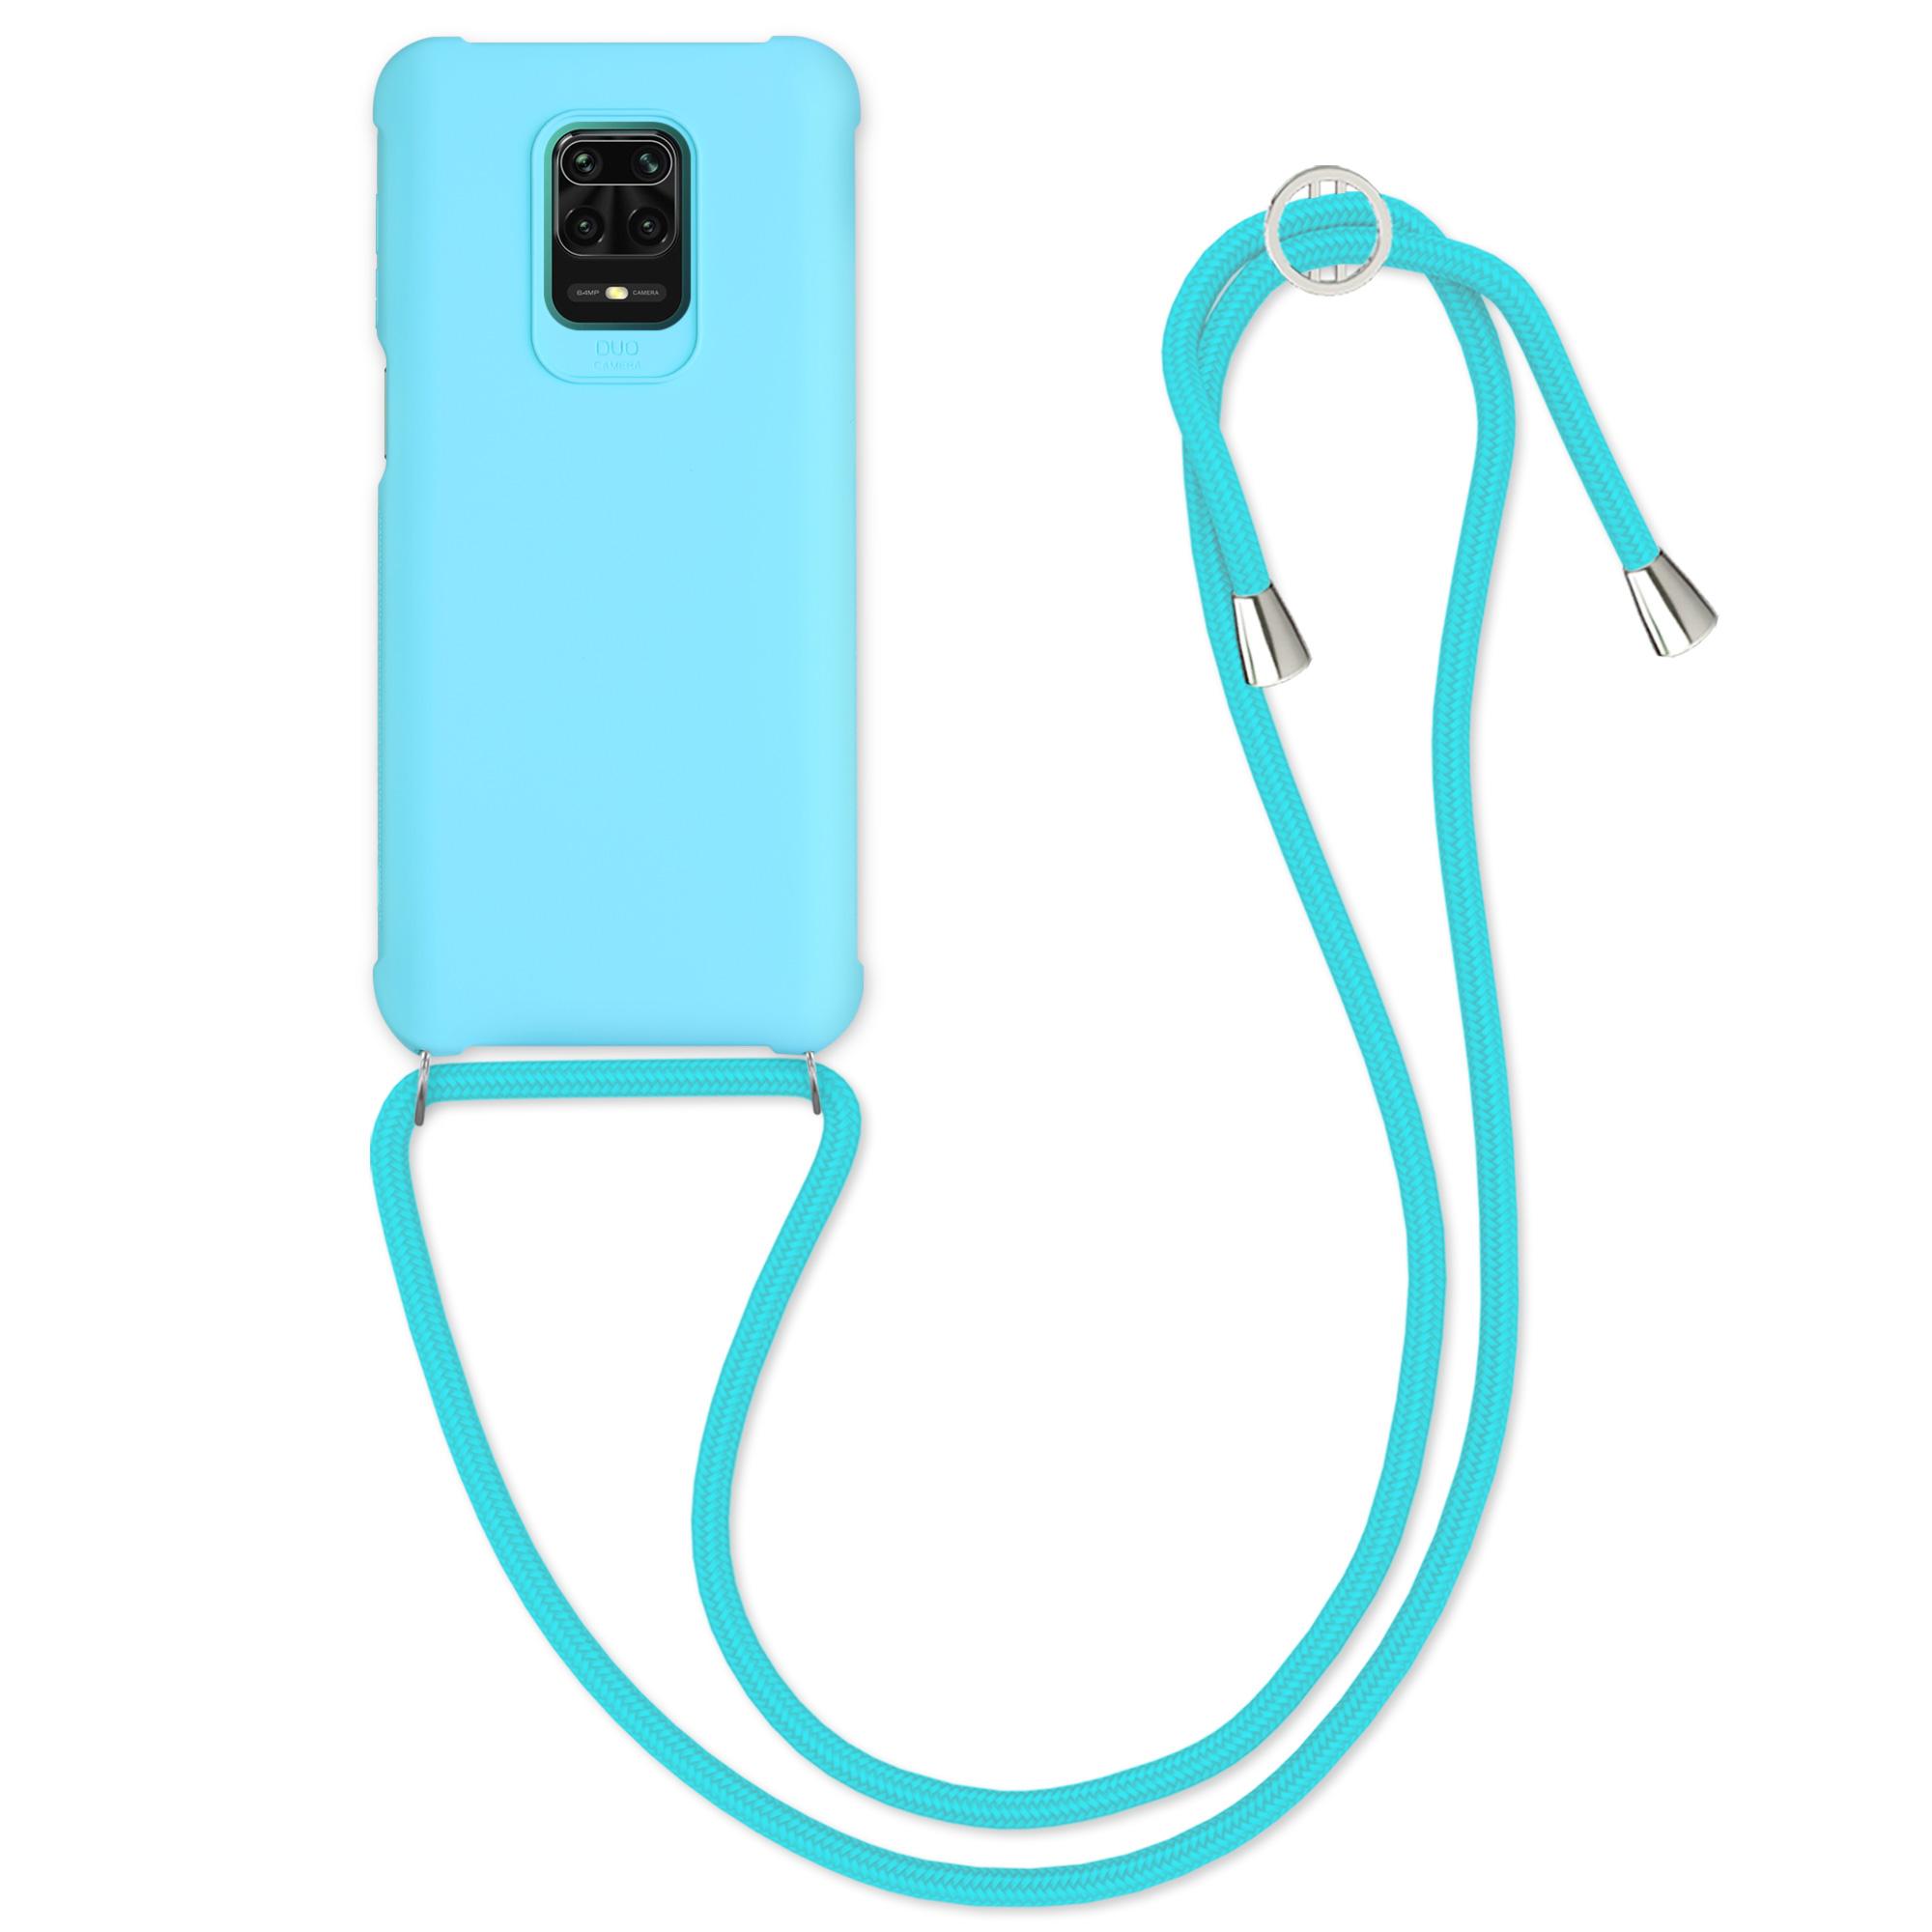 MatteTPUpouzdro | obal pro Xiaomi Redmi Note 9S | 9 Pro | 9 - Světle modrý